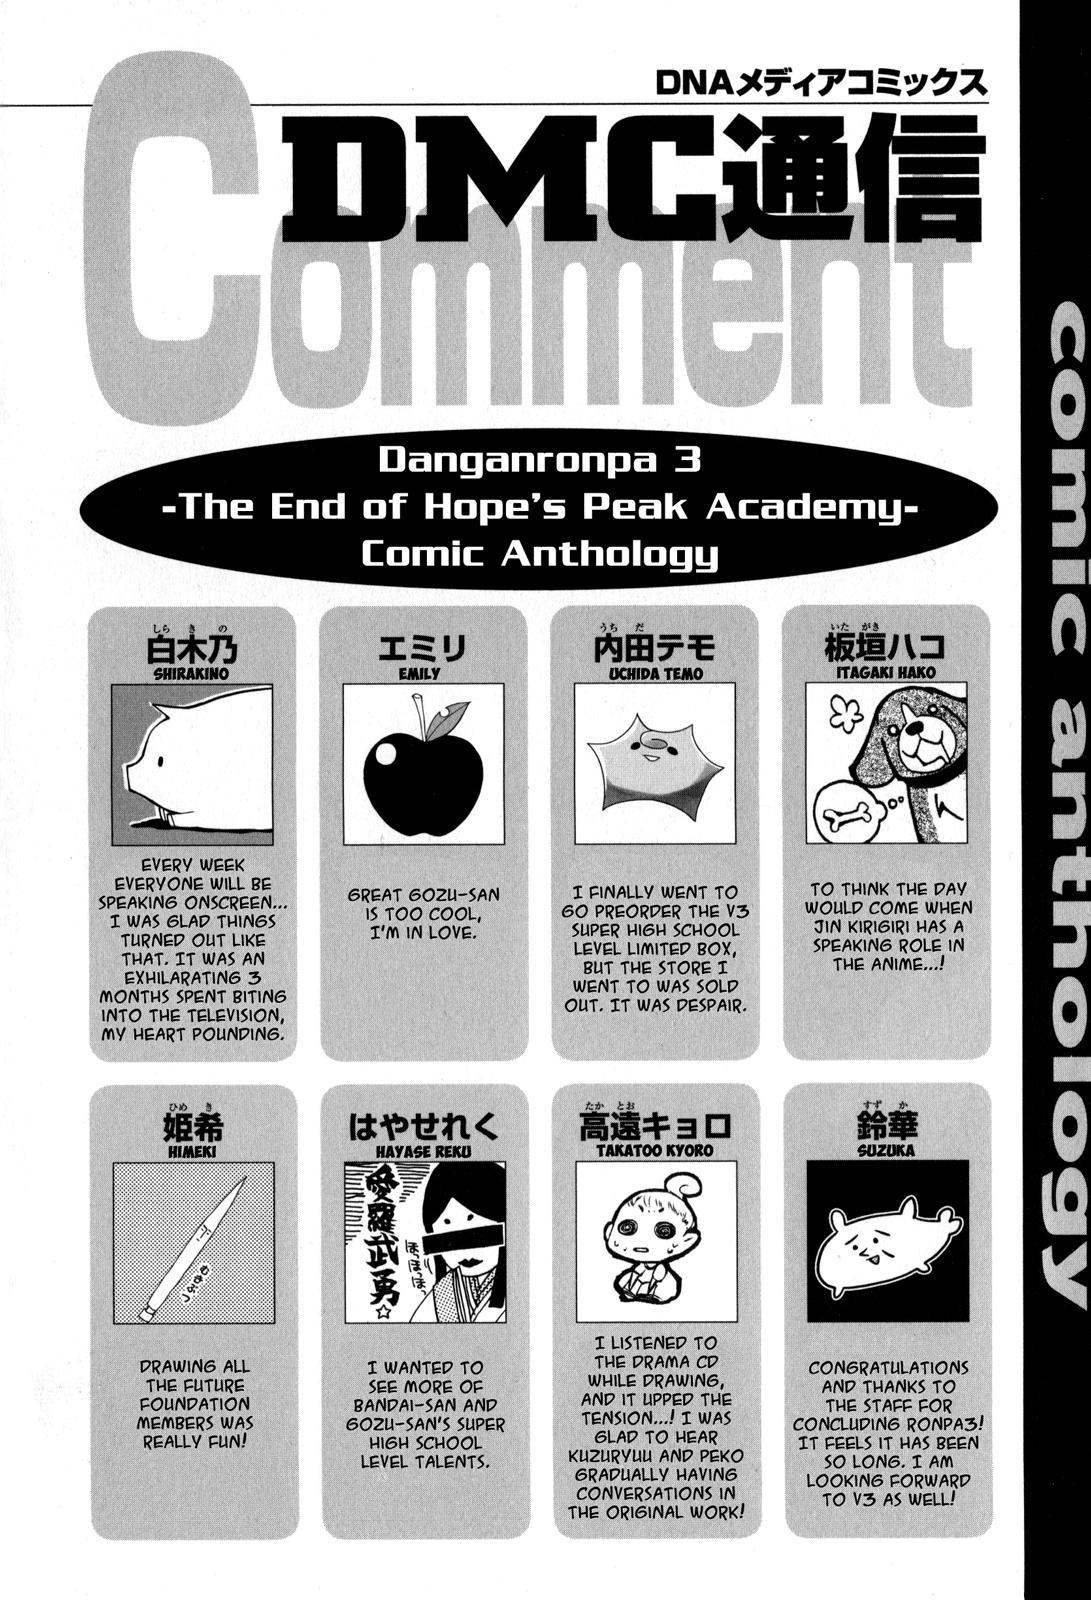 Danganronpa 3: The End of Hope's Peak Academy - Future Arc & Despair Arc Comic Anthology (DNA Media) - Chapter 2